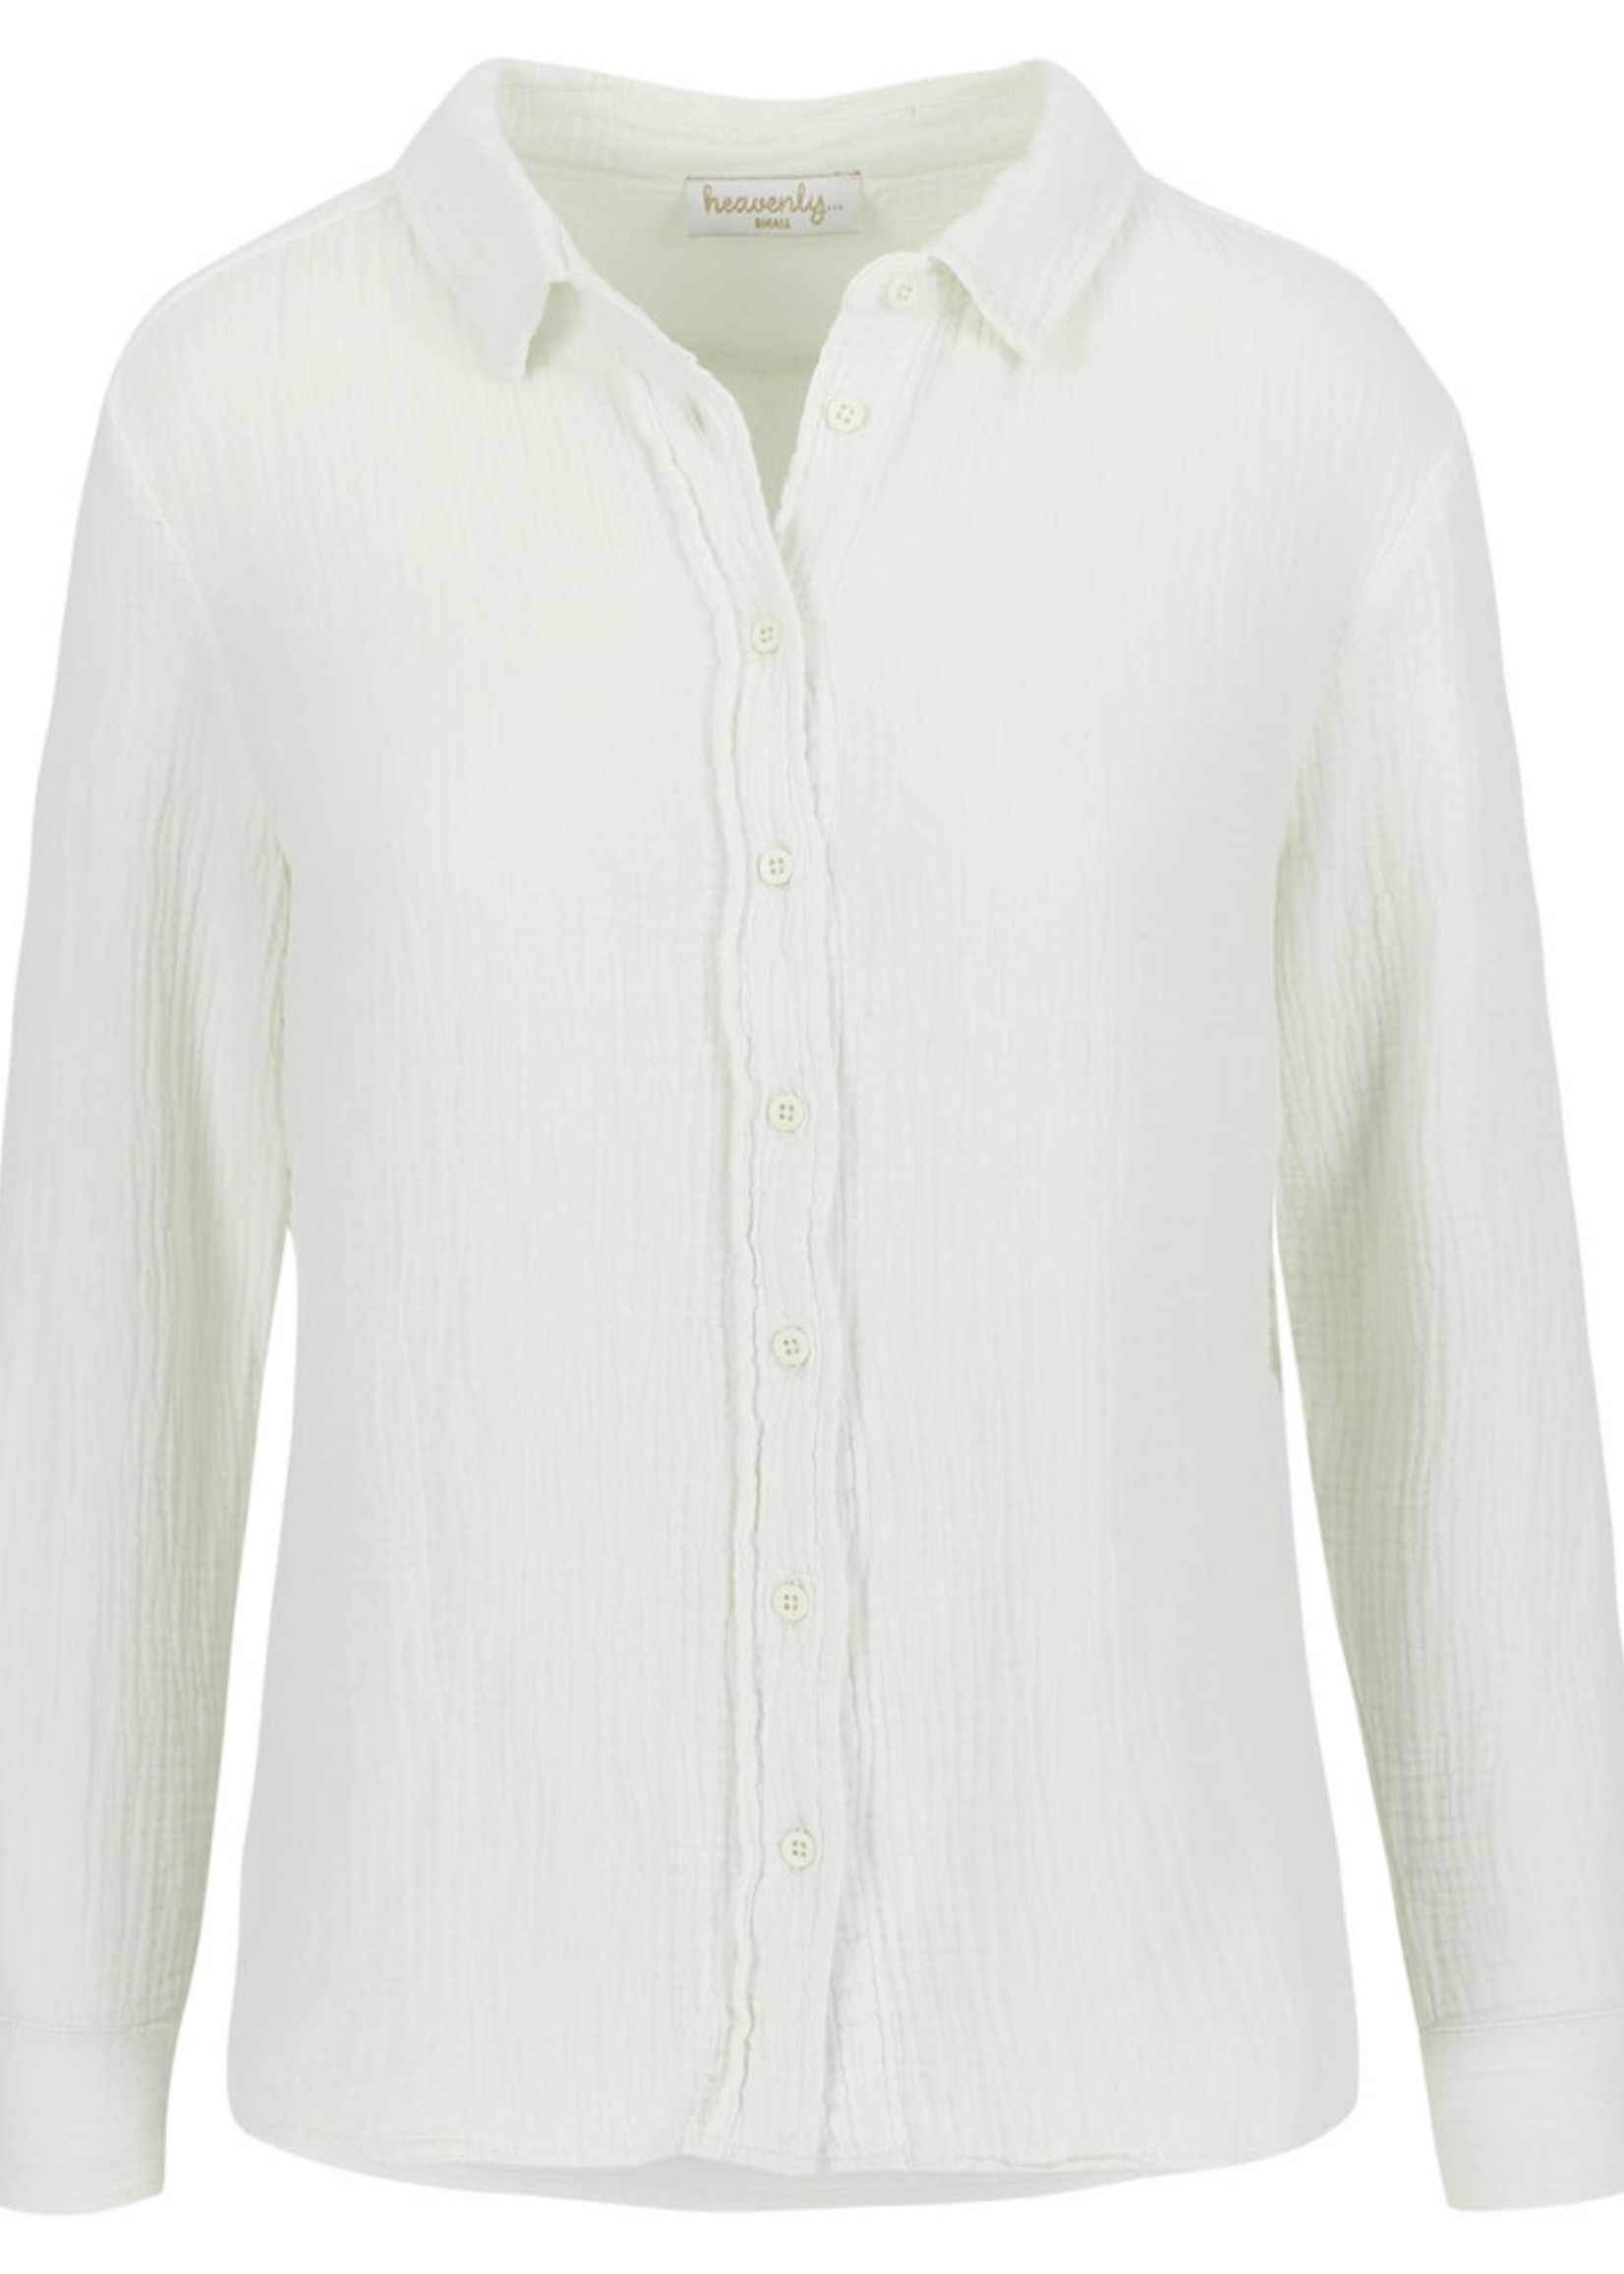 Heavenly Danni Shirt - Cream